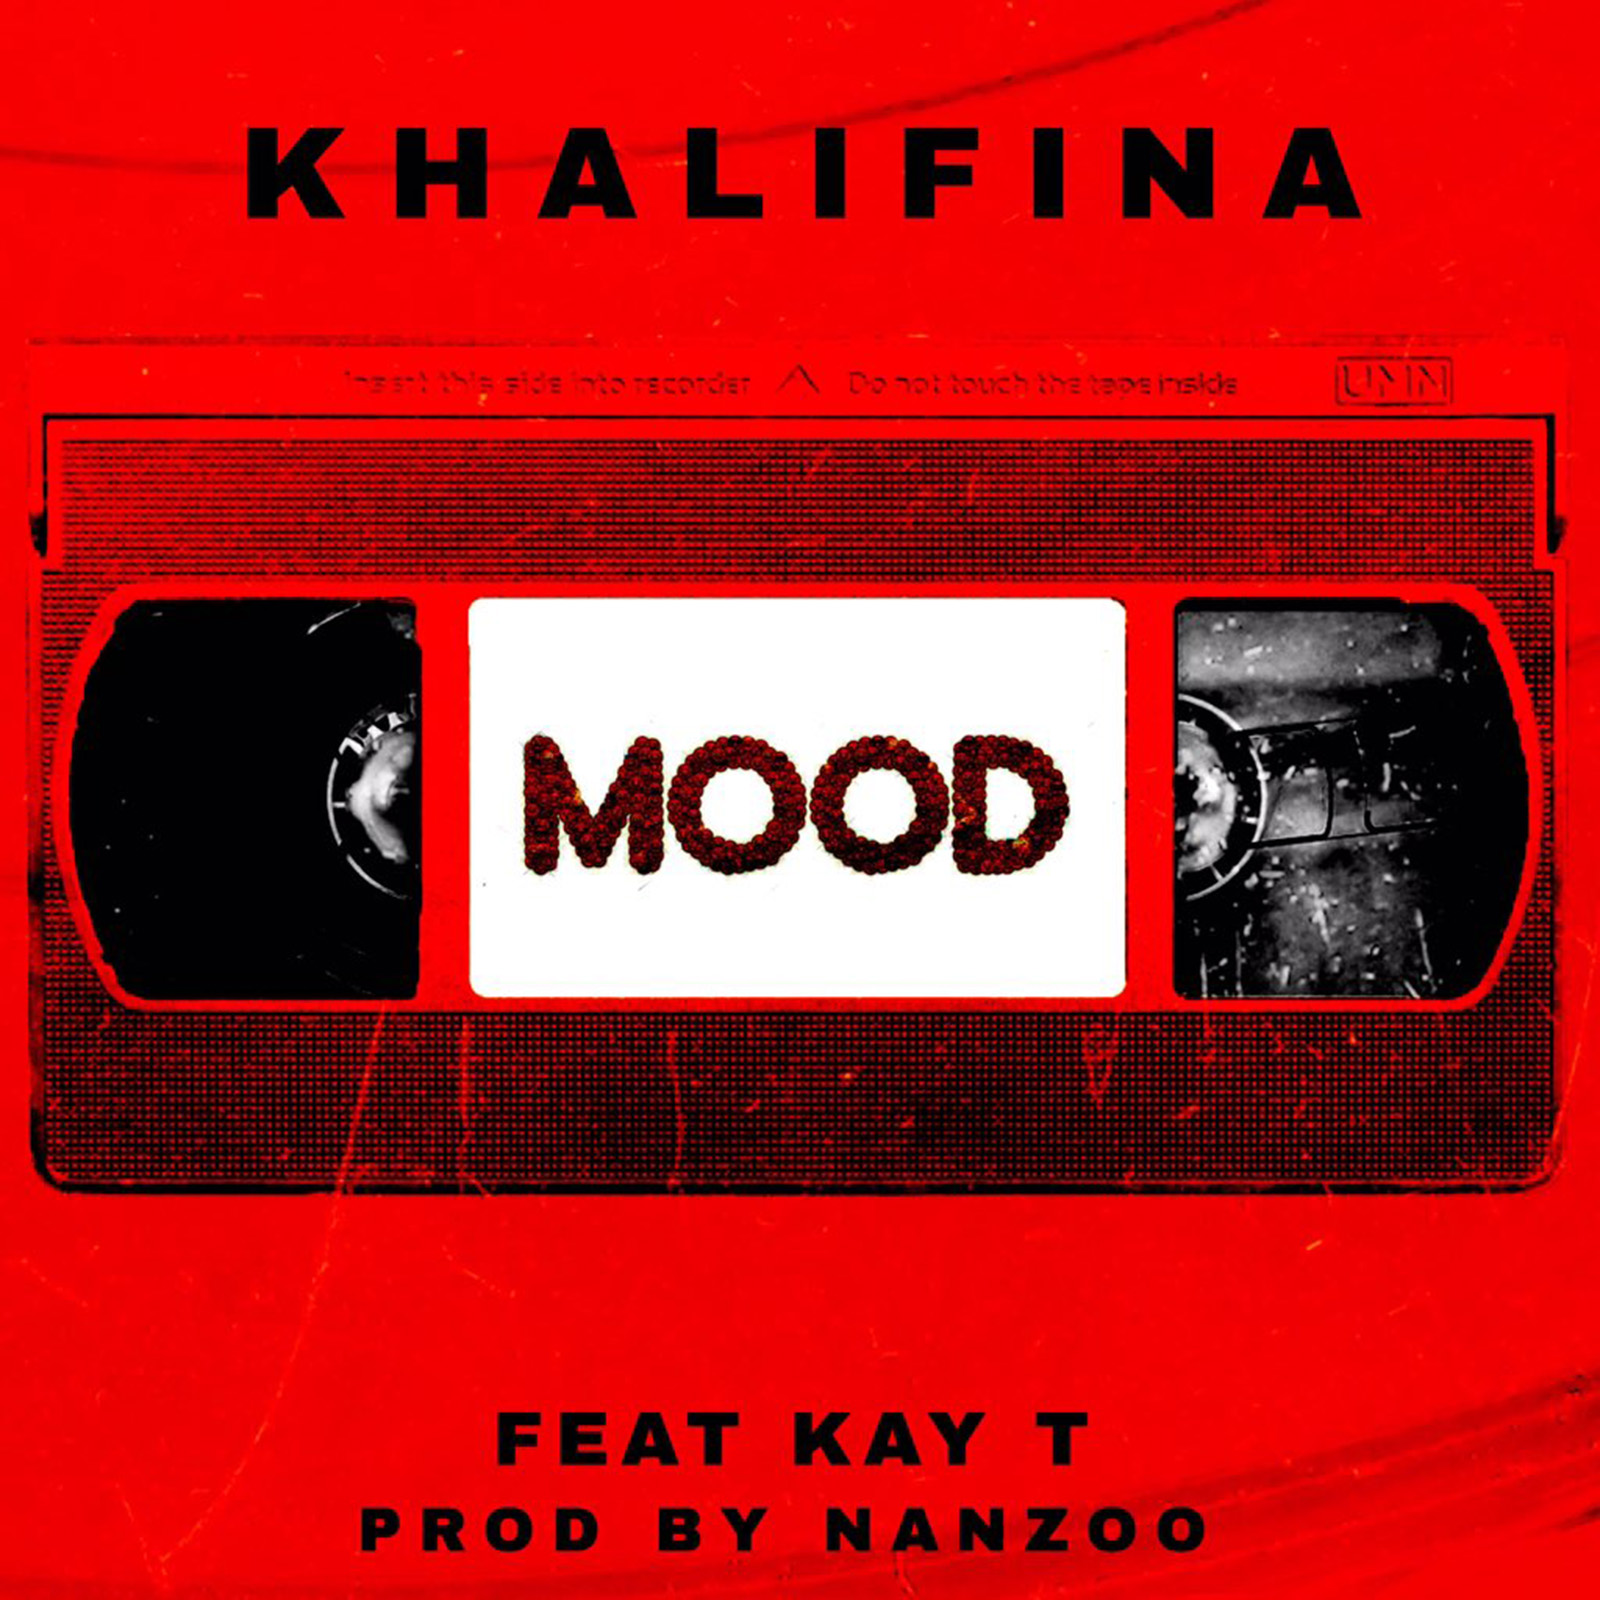 Mood by Khalifina feat. Kay-T